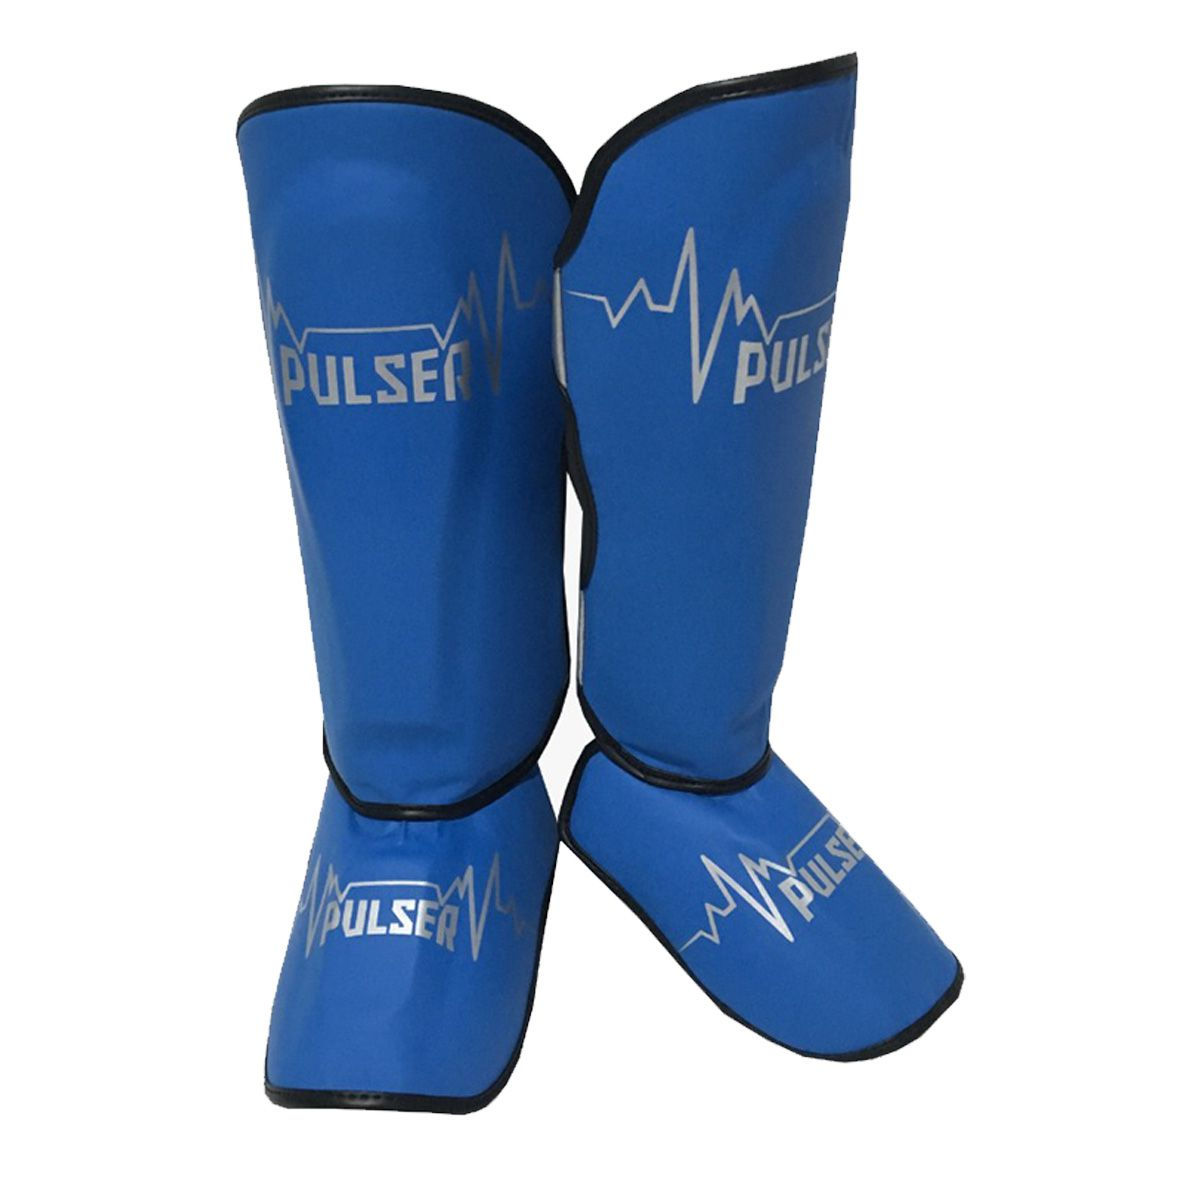 Caneleira Muay Thai MMA Pulsar Azul Claro Média 30mm - Pulser  - PRALUTA SHOP